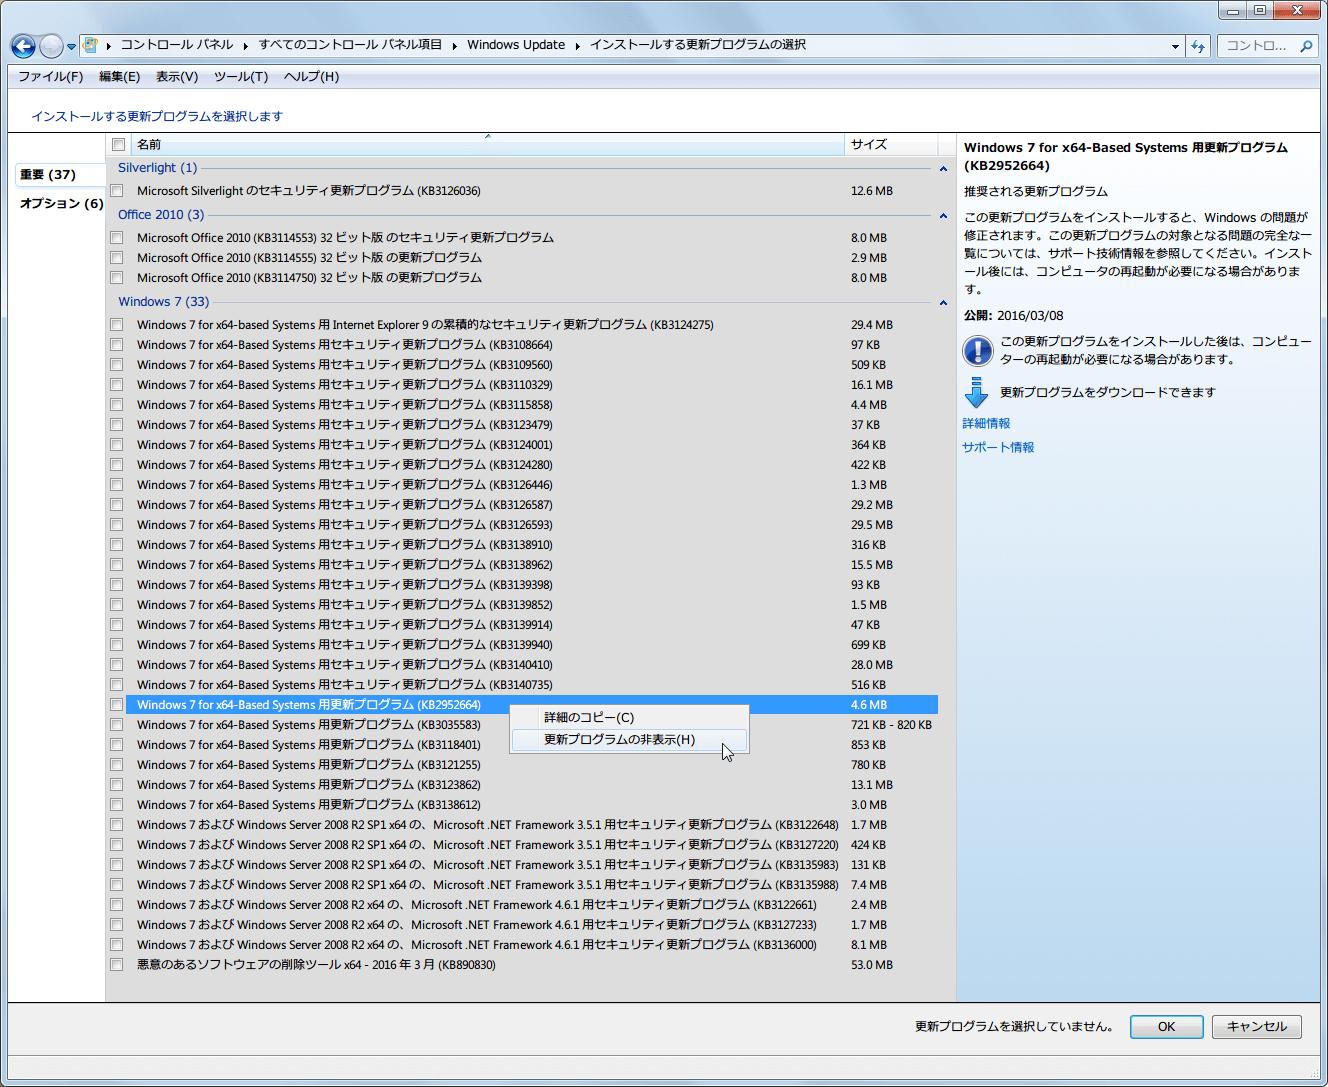 Windows 7 64bit Windows Update 重要 2016年3月8日公開 KB2952664 更新プログラムの非表示